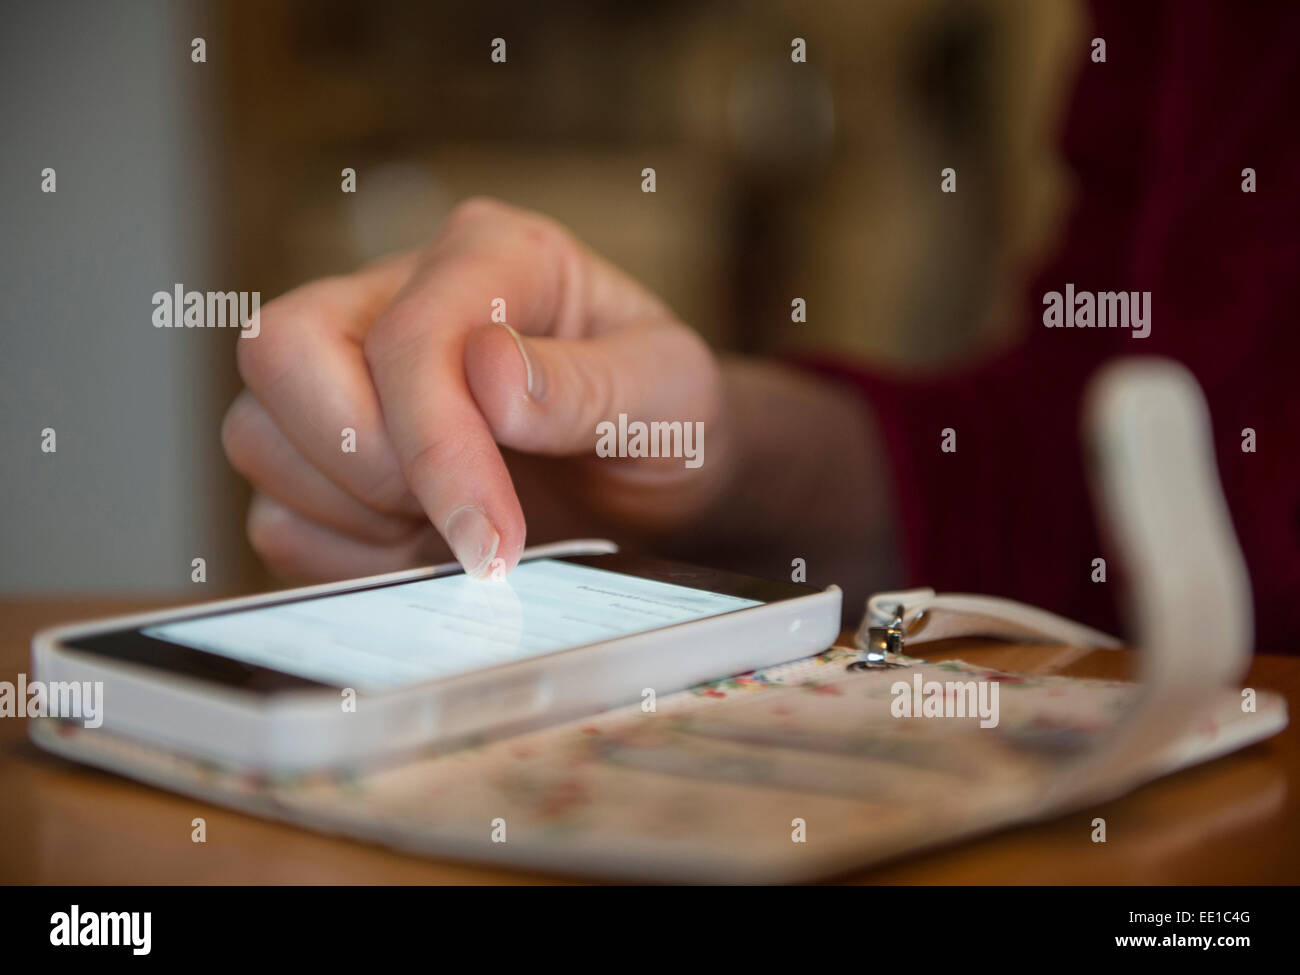 Female texting on a white smartphone i phonecase - Stock Image